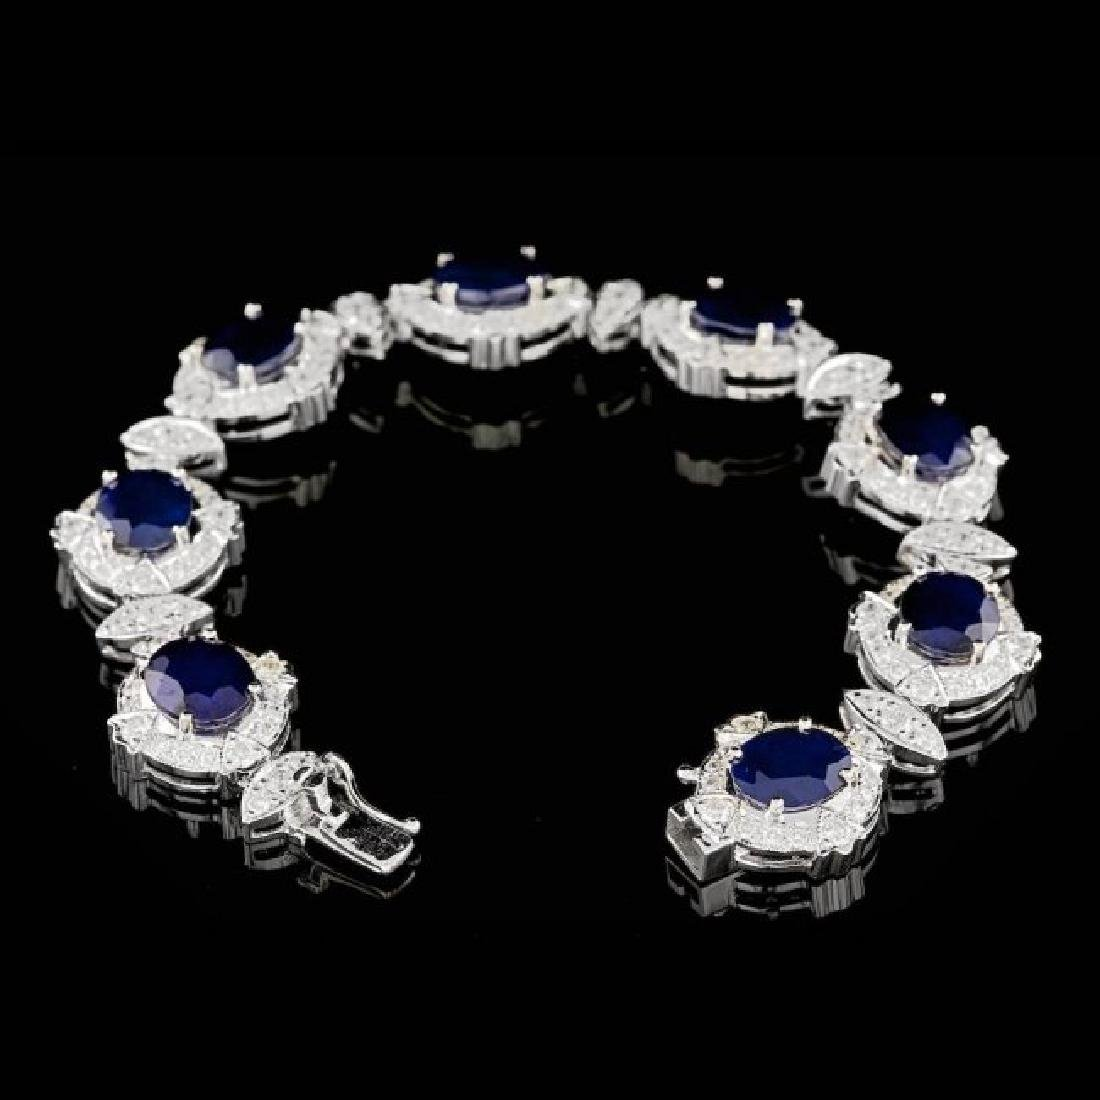 14k Gold 24.50ct Sapphire 5.50ct Diamond Bracelet - 2